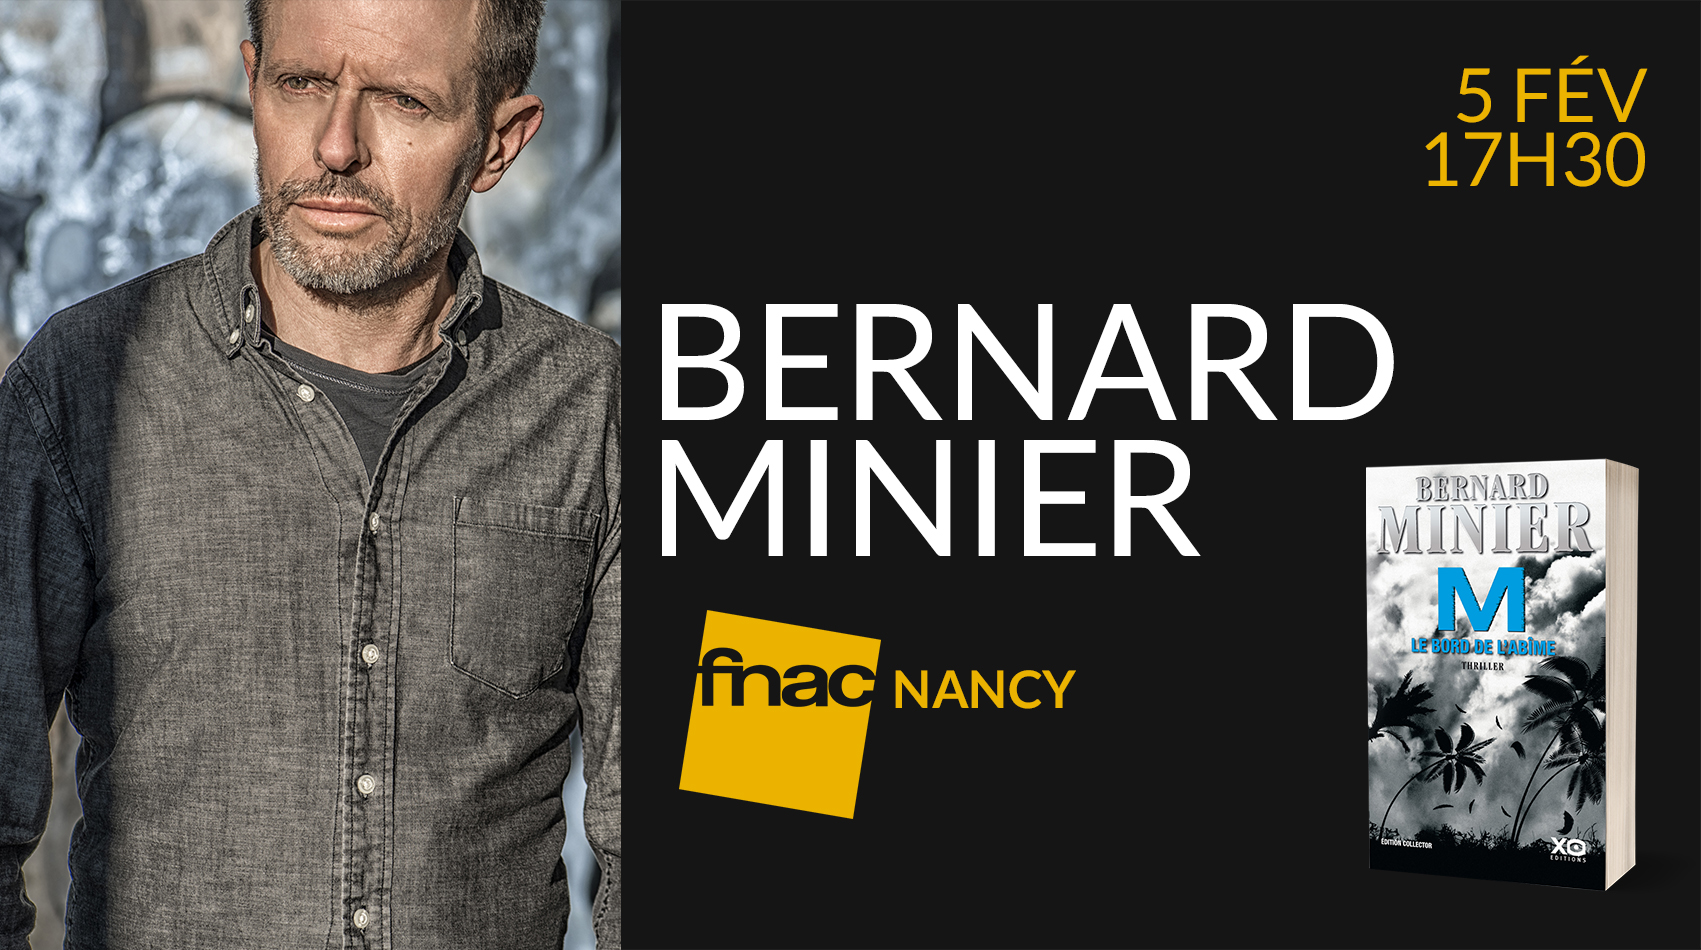 RENCONTRE DÉDICACE BERNARD MINIER - FNAC NANCY